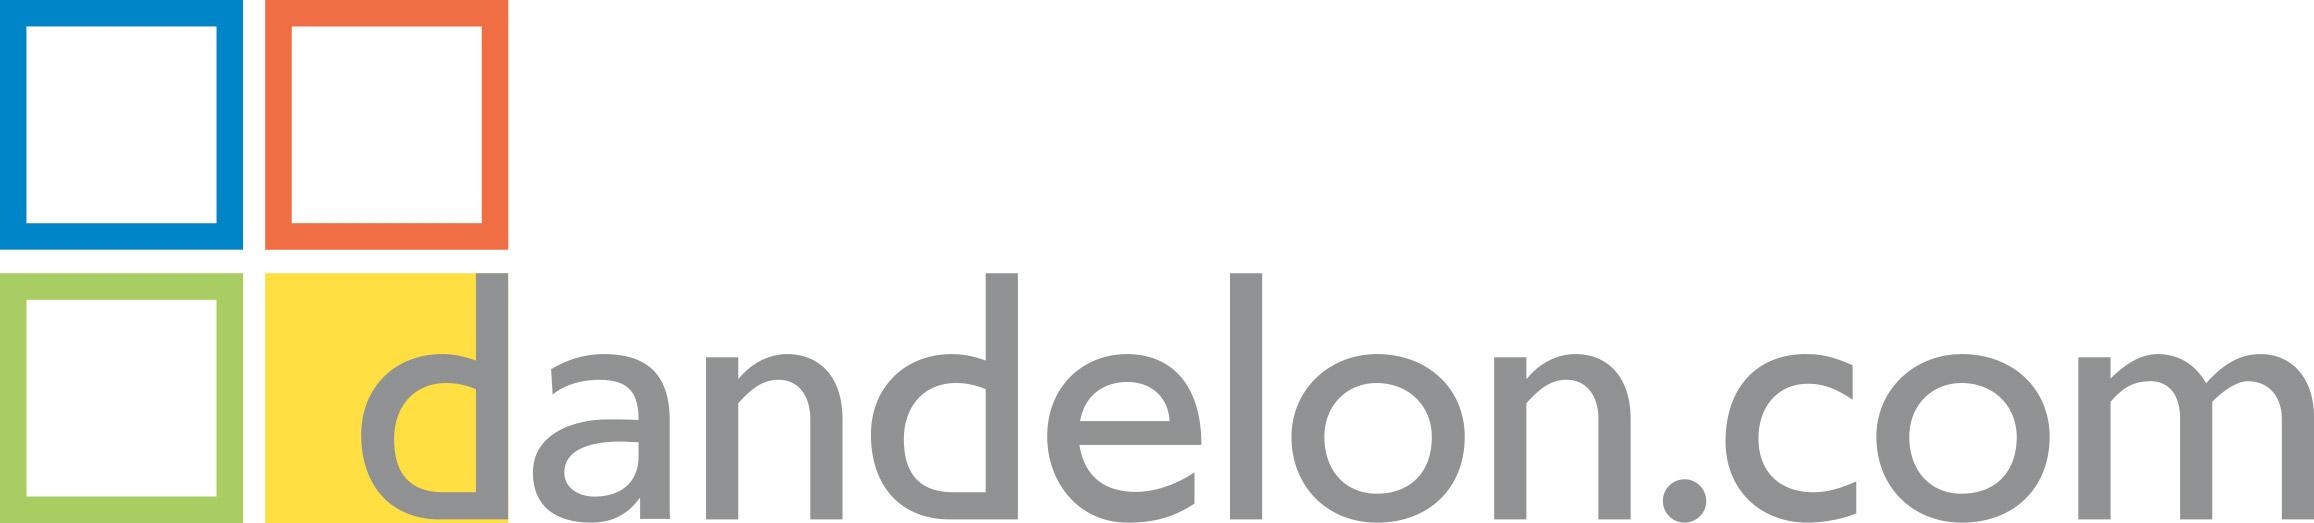 dandelon.com